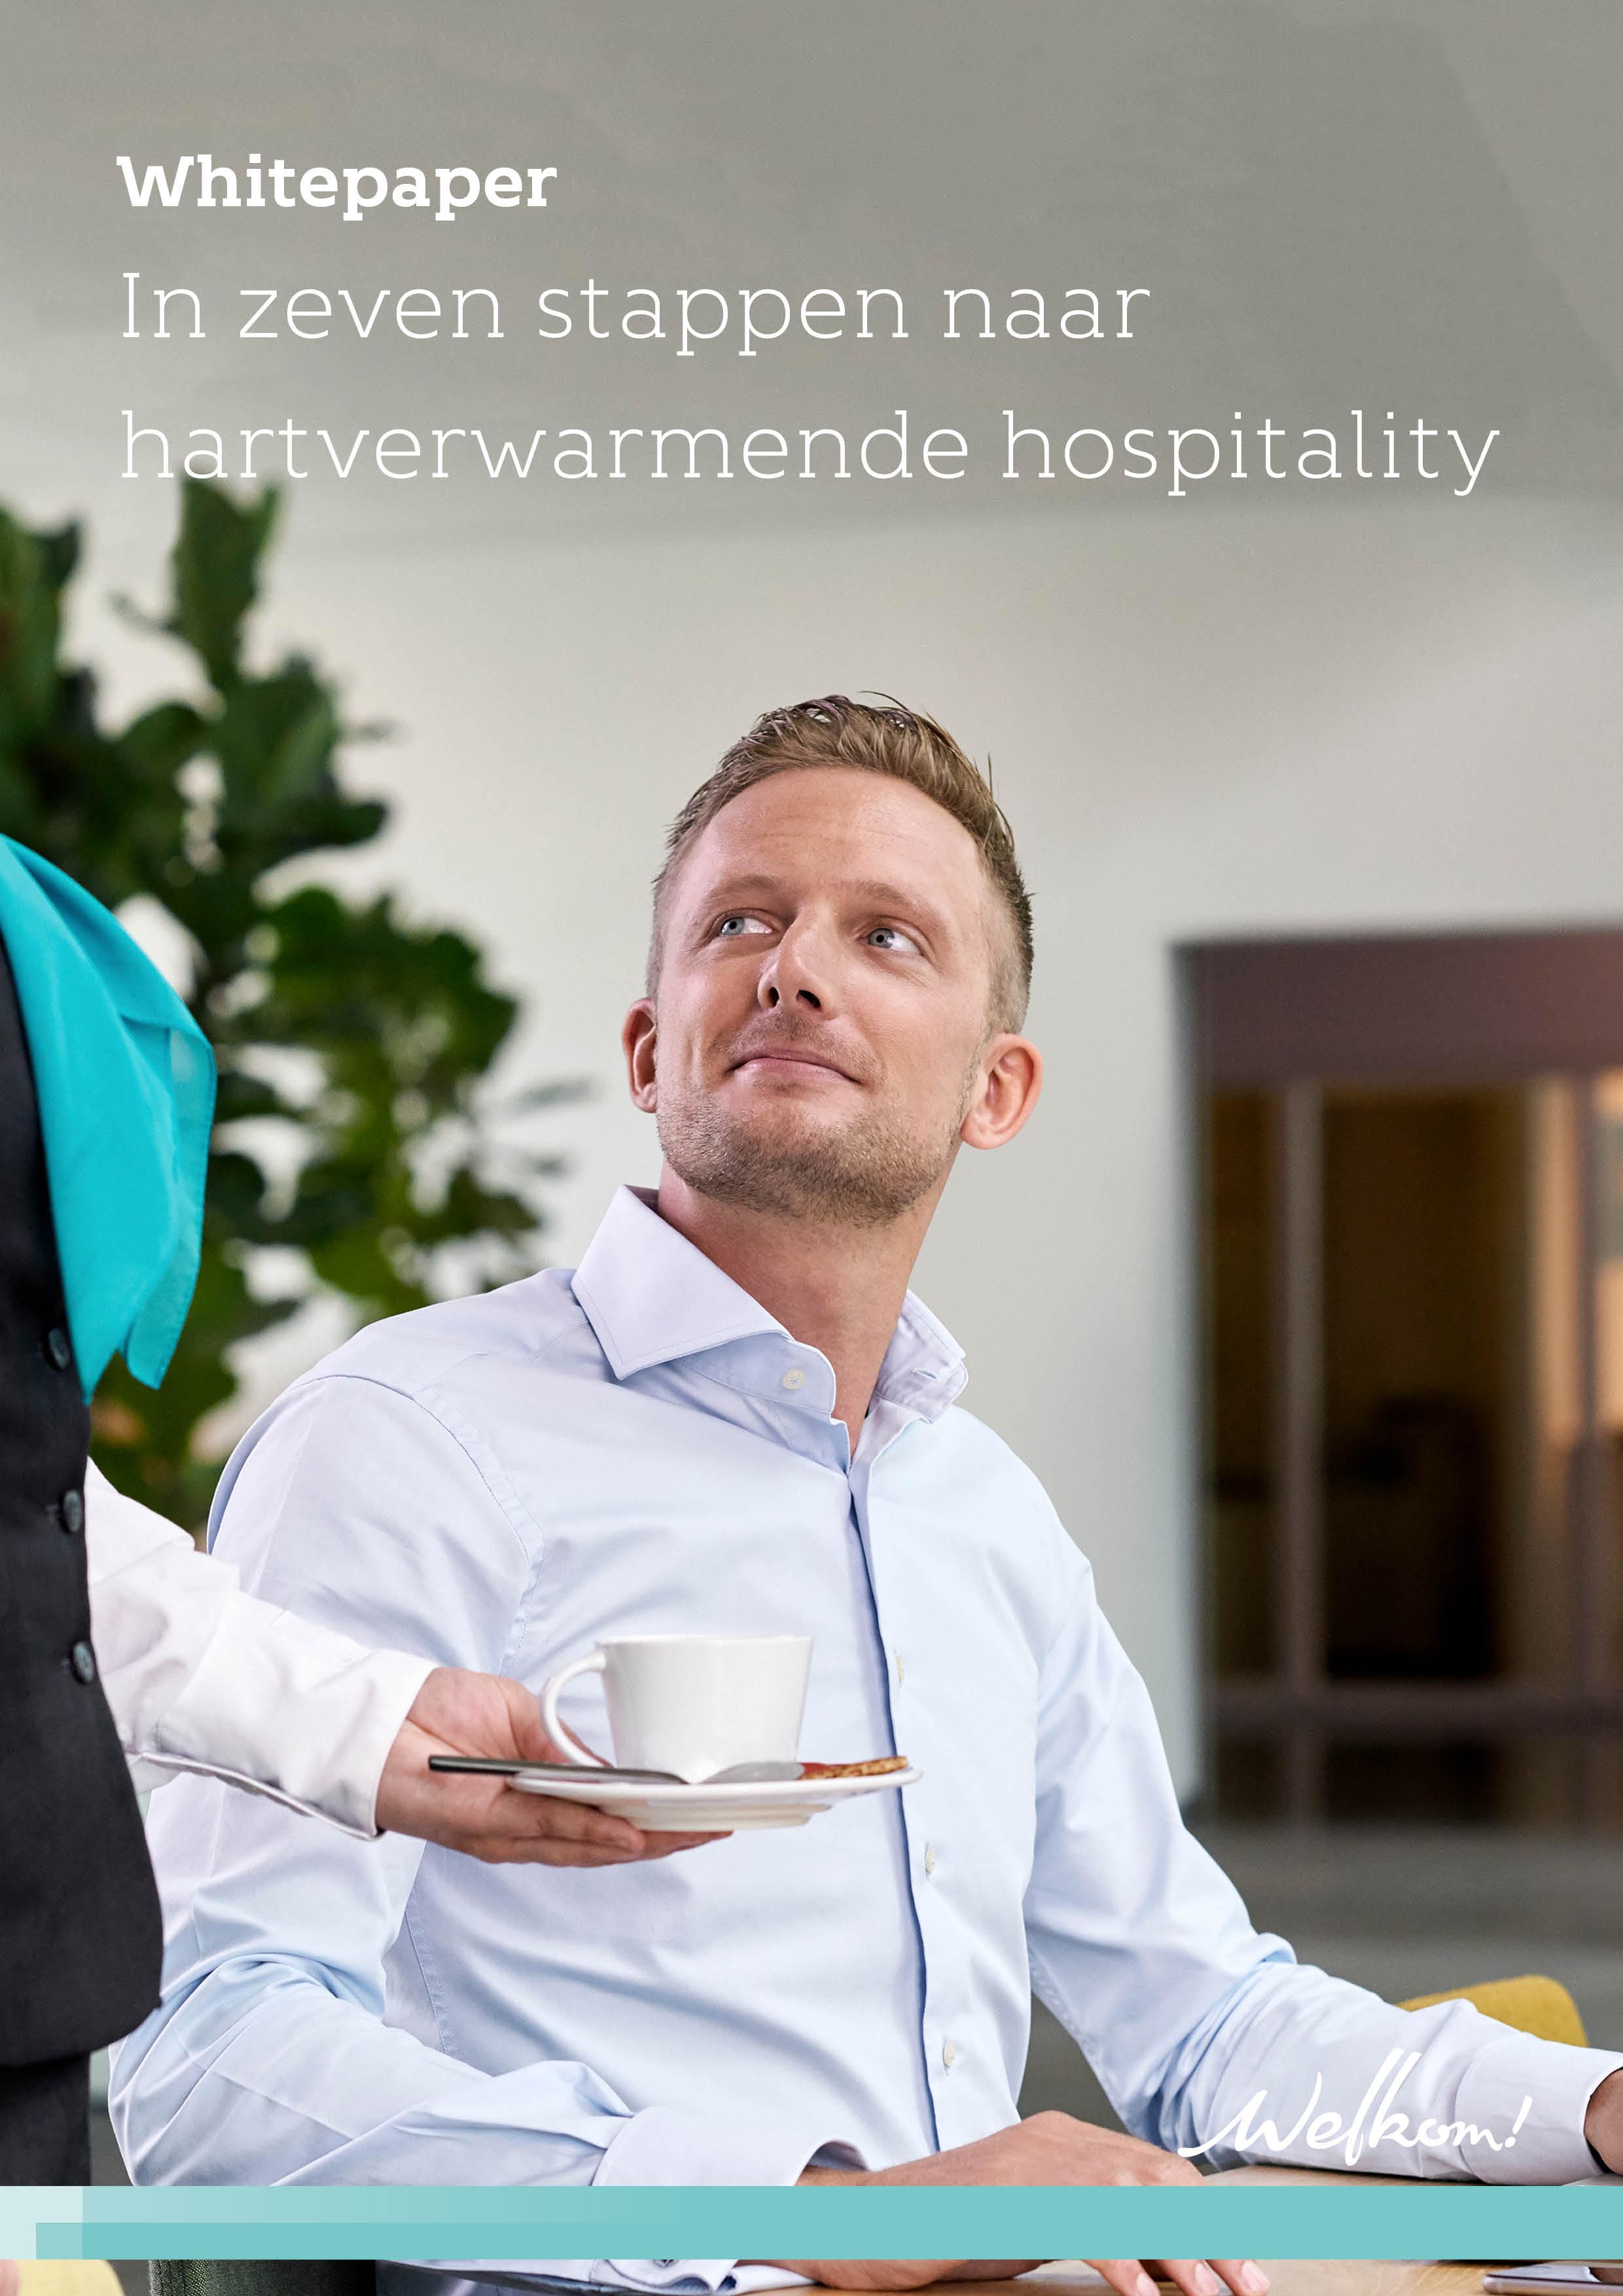 Welkom Whitepaper - In 7 stappen naar hartverwarmende hospitality